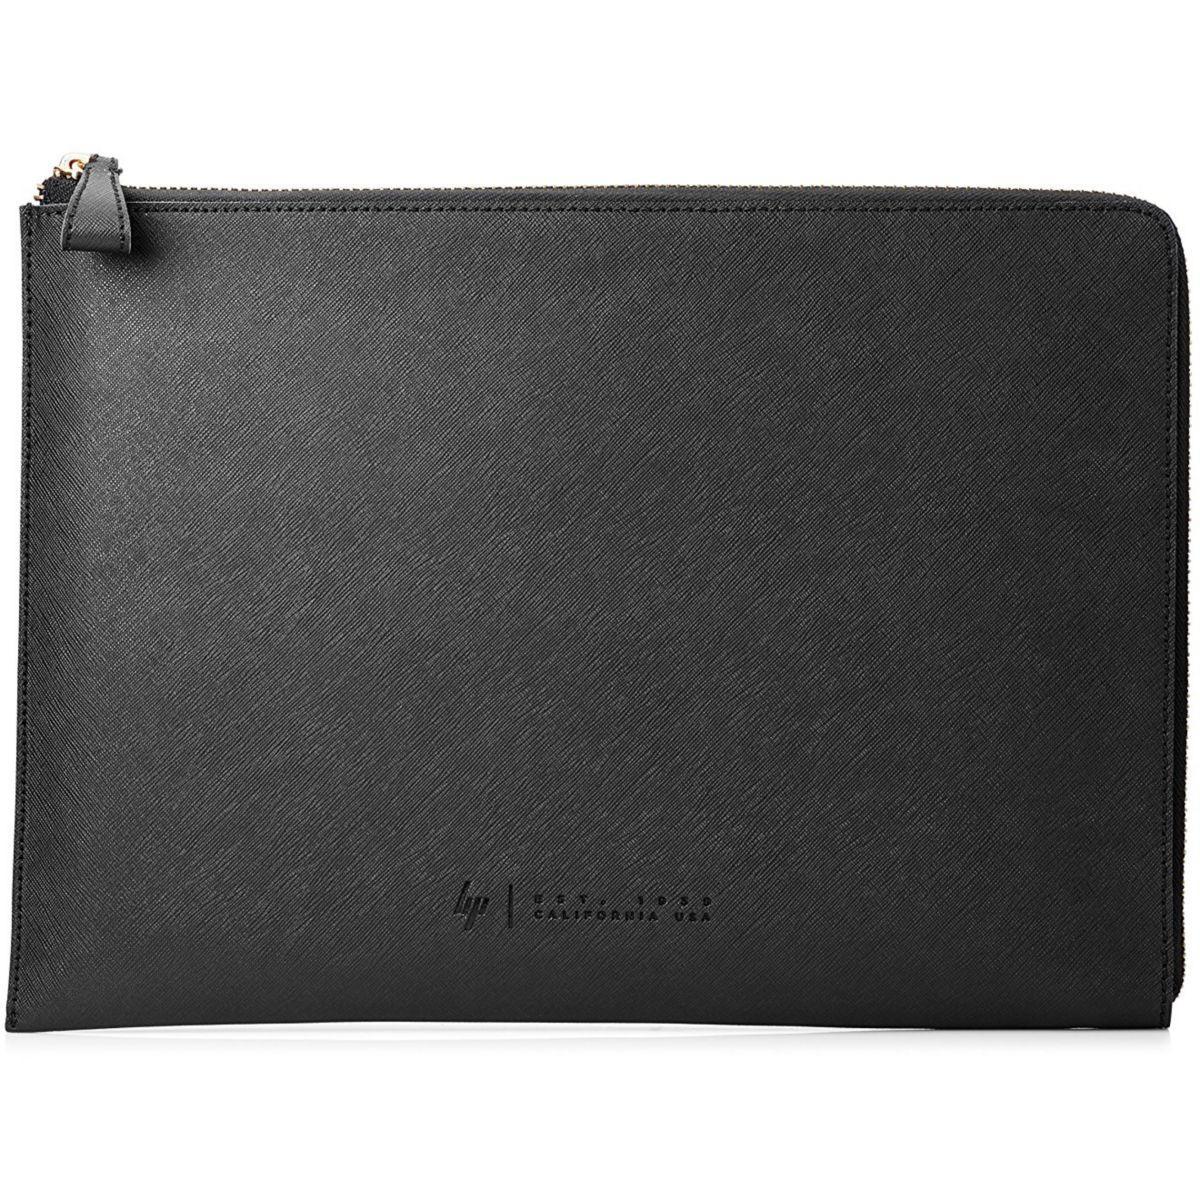 Etui hp leather sleeve 13.3' noir - livraison offerte : code premium